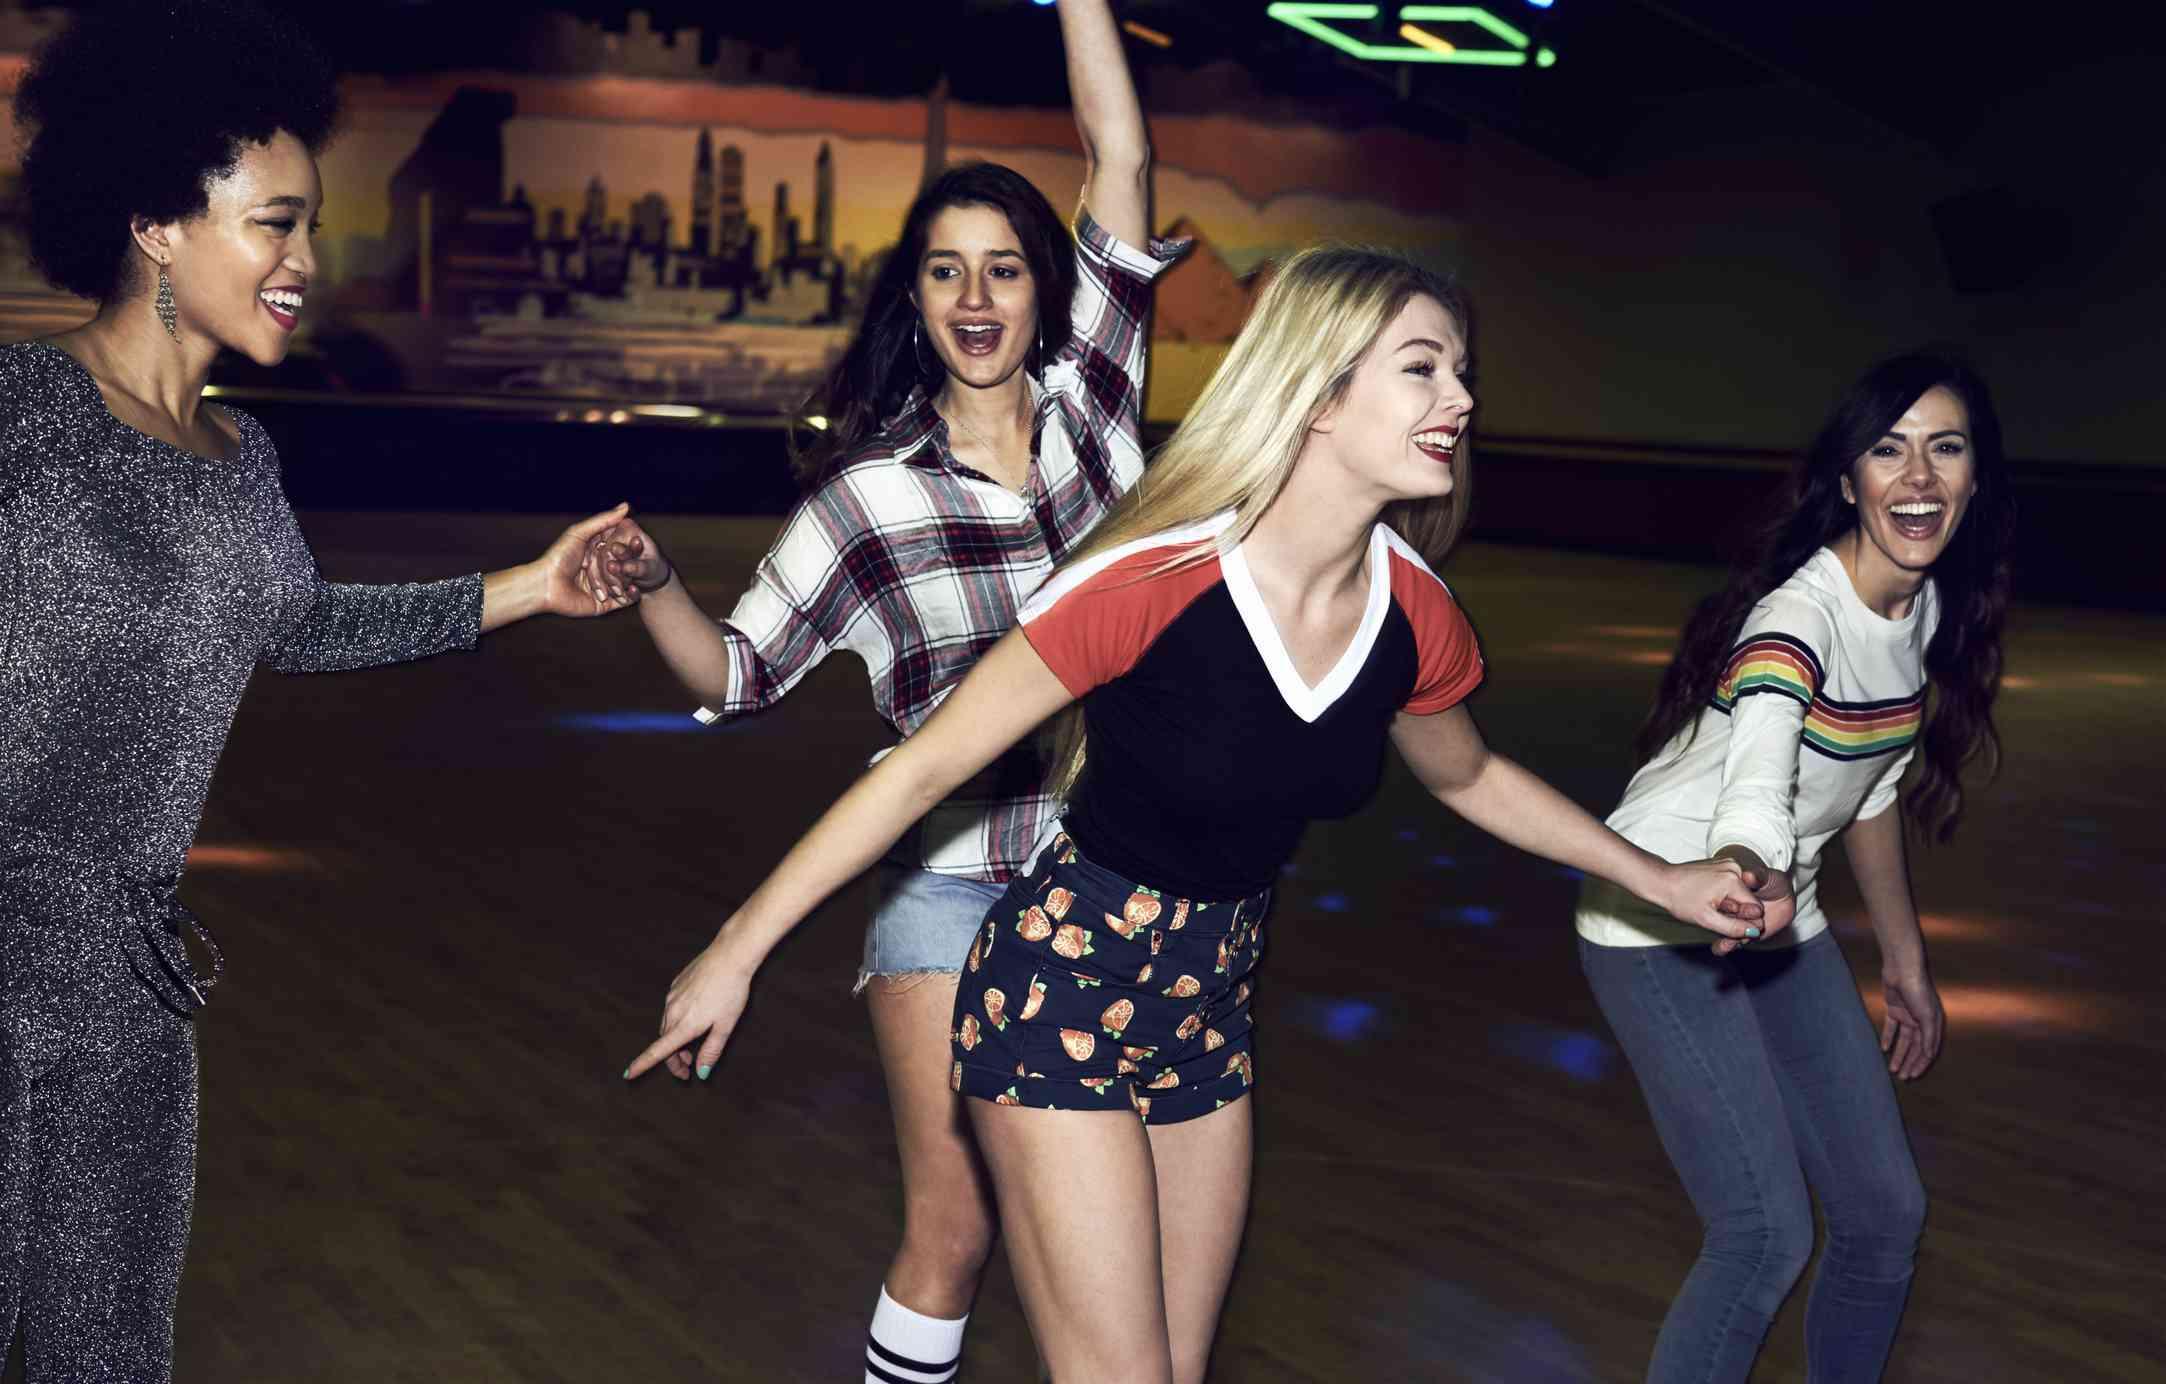 Four girlfriends roller blading